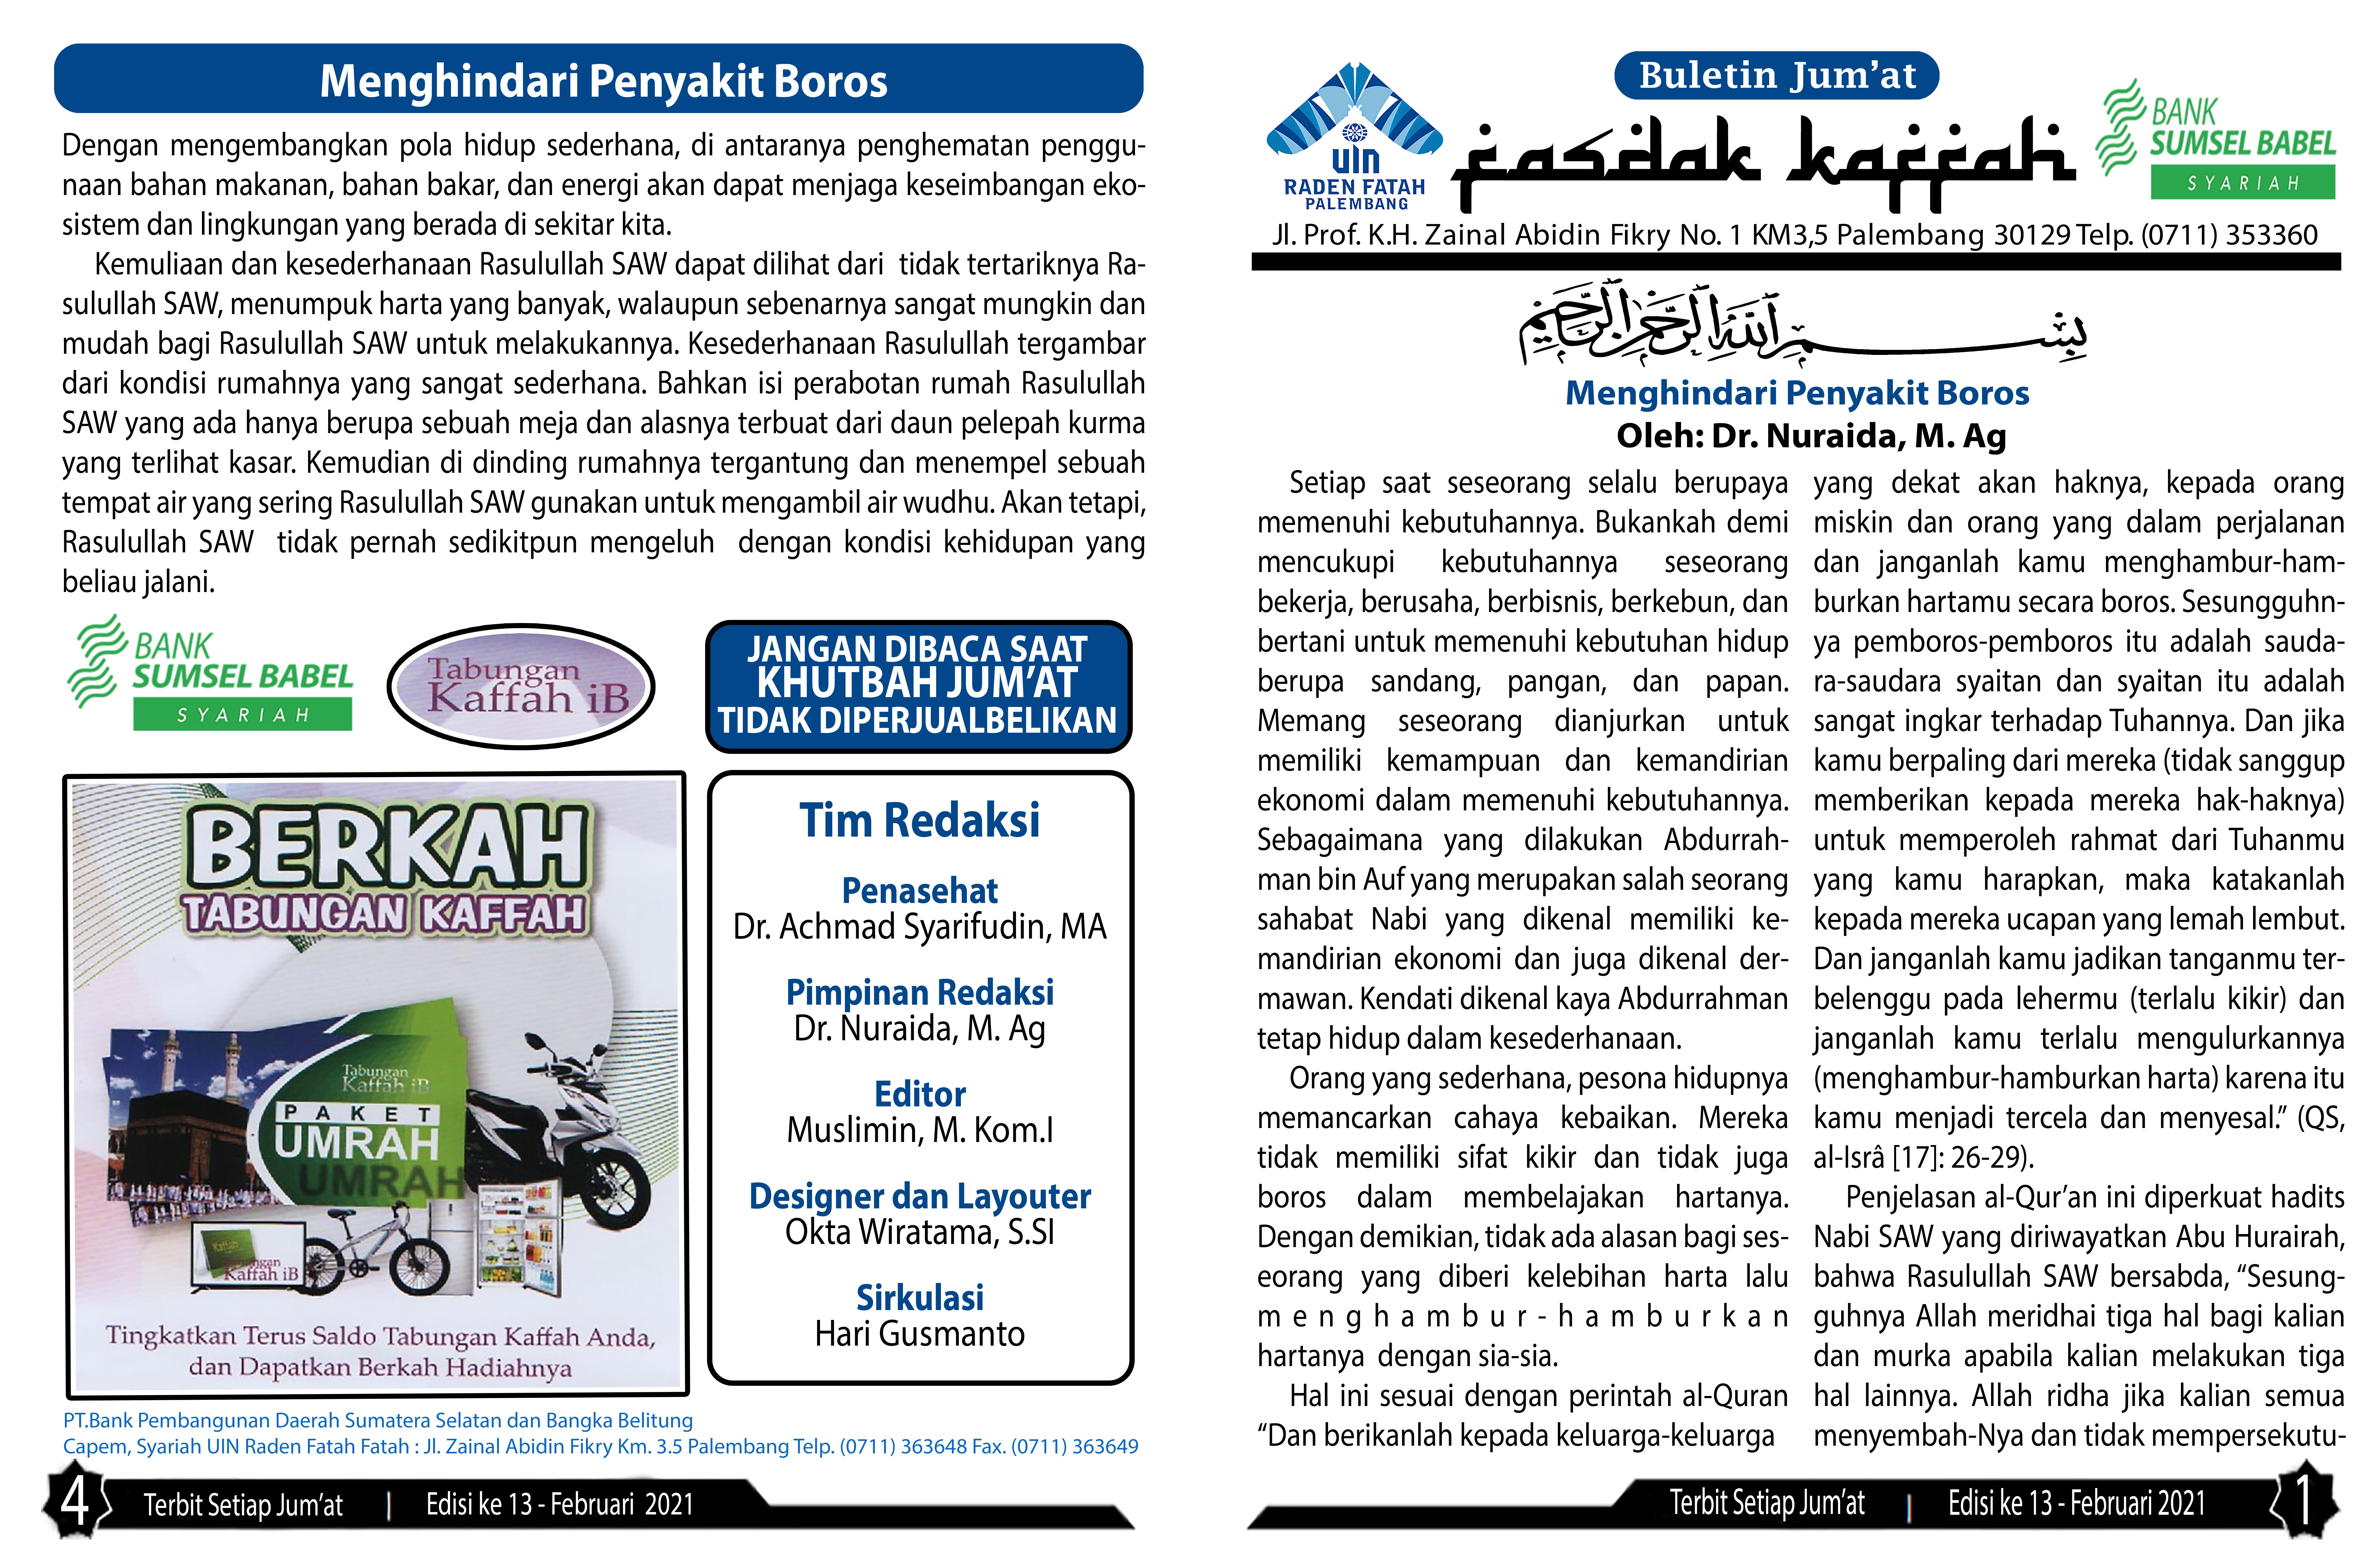 template-1-edisi-13